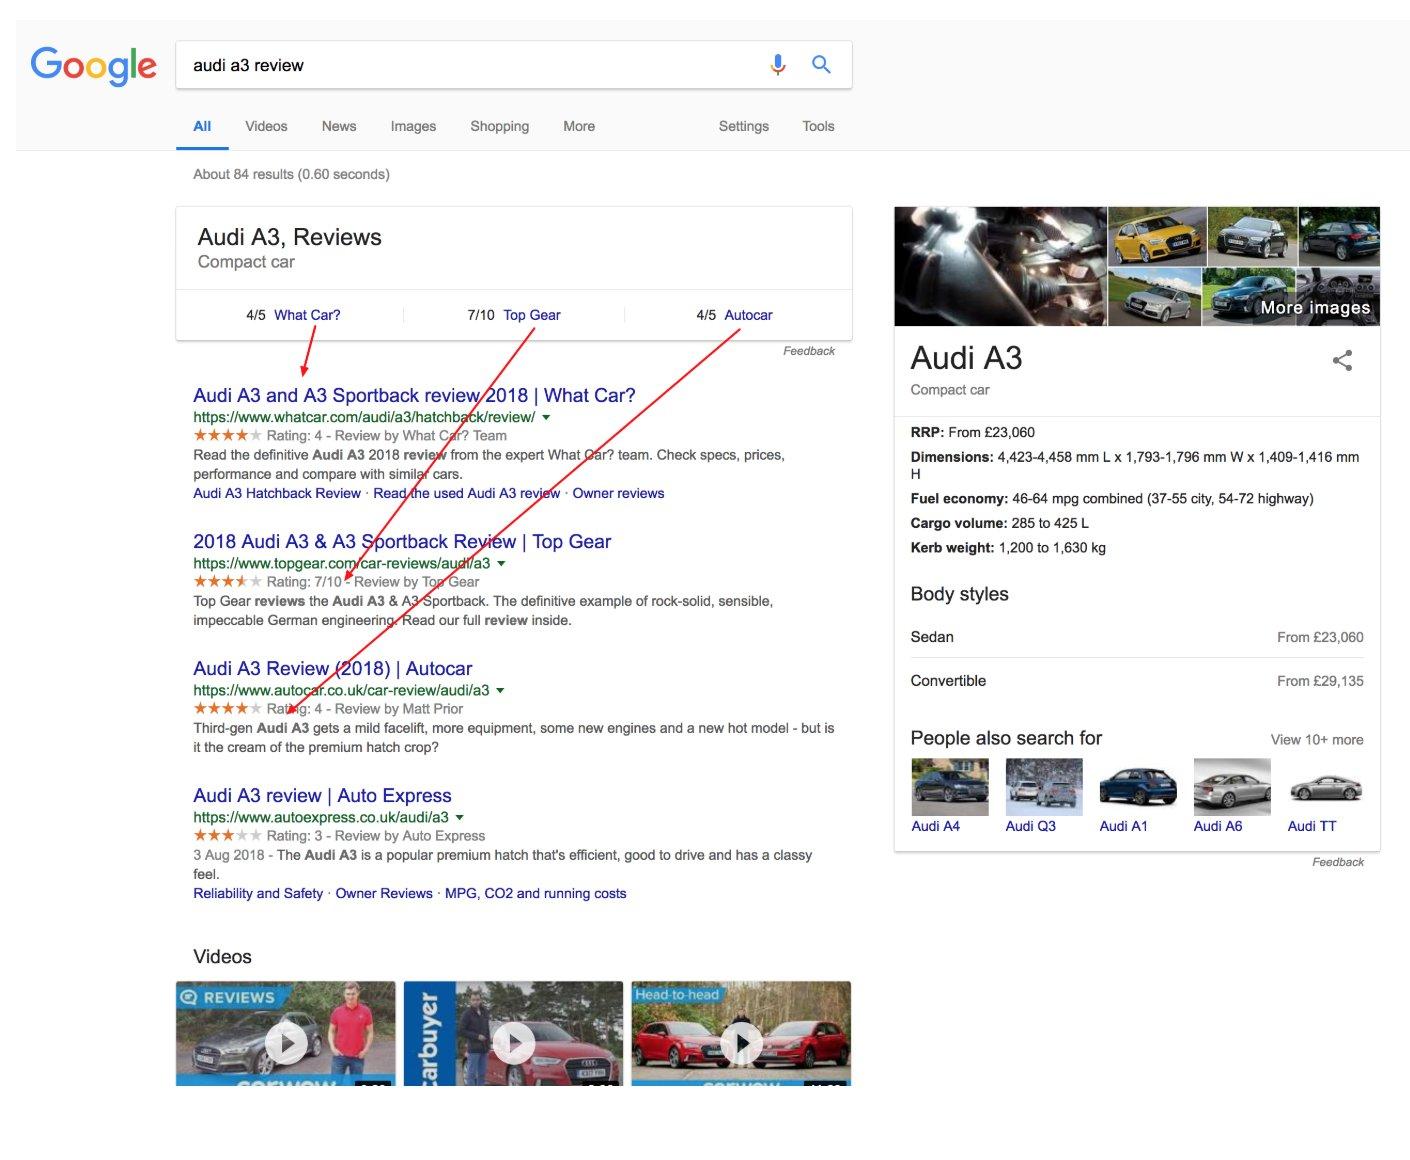 Audi a3 review